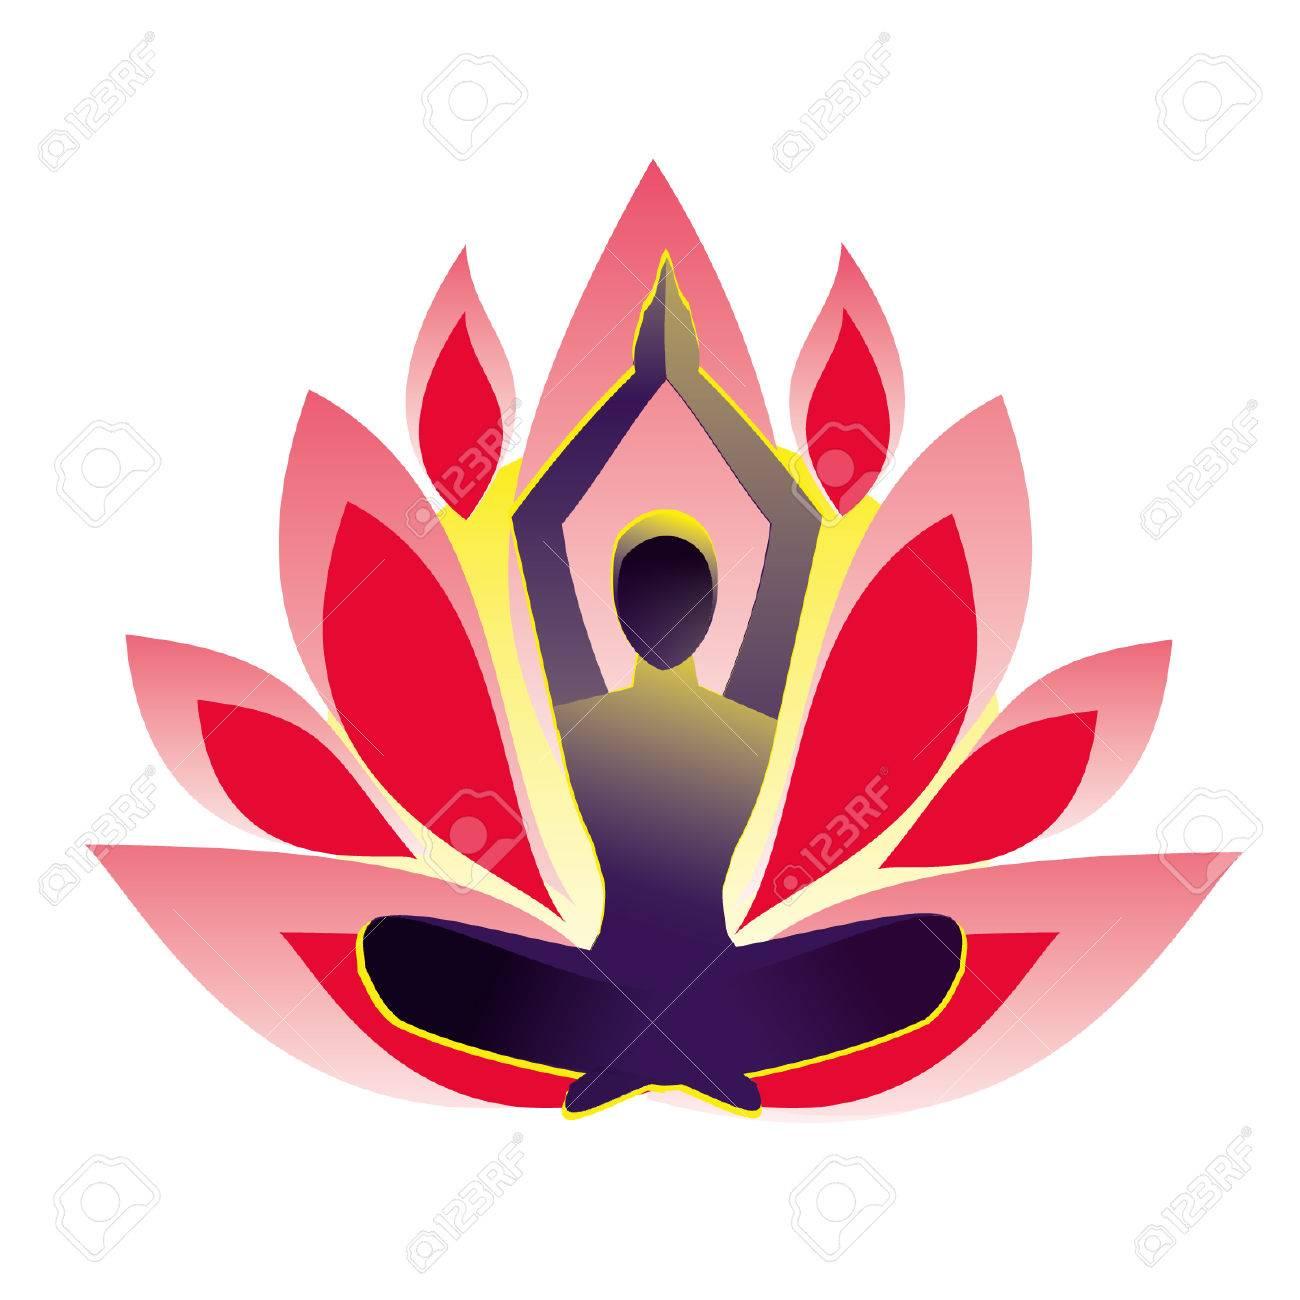 Yoga Pose Lotus Vector Illustration Royalty Free Cliparts Vectors